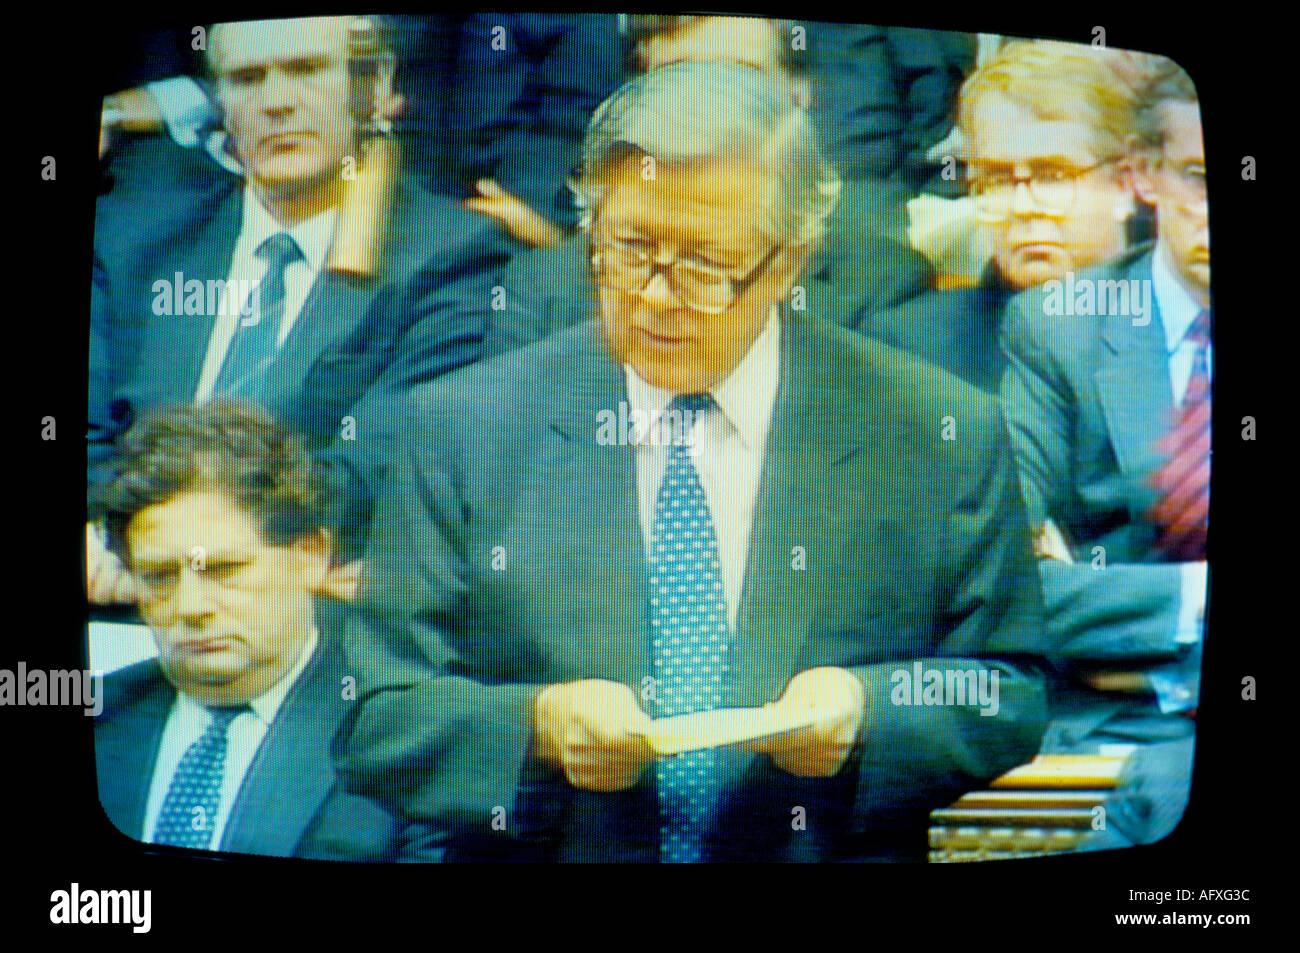 Sir Geoffrey Howe on TV Resignation Speech House of Commons London, November 1st 1990. HOMER SYKES - Stock Image